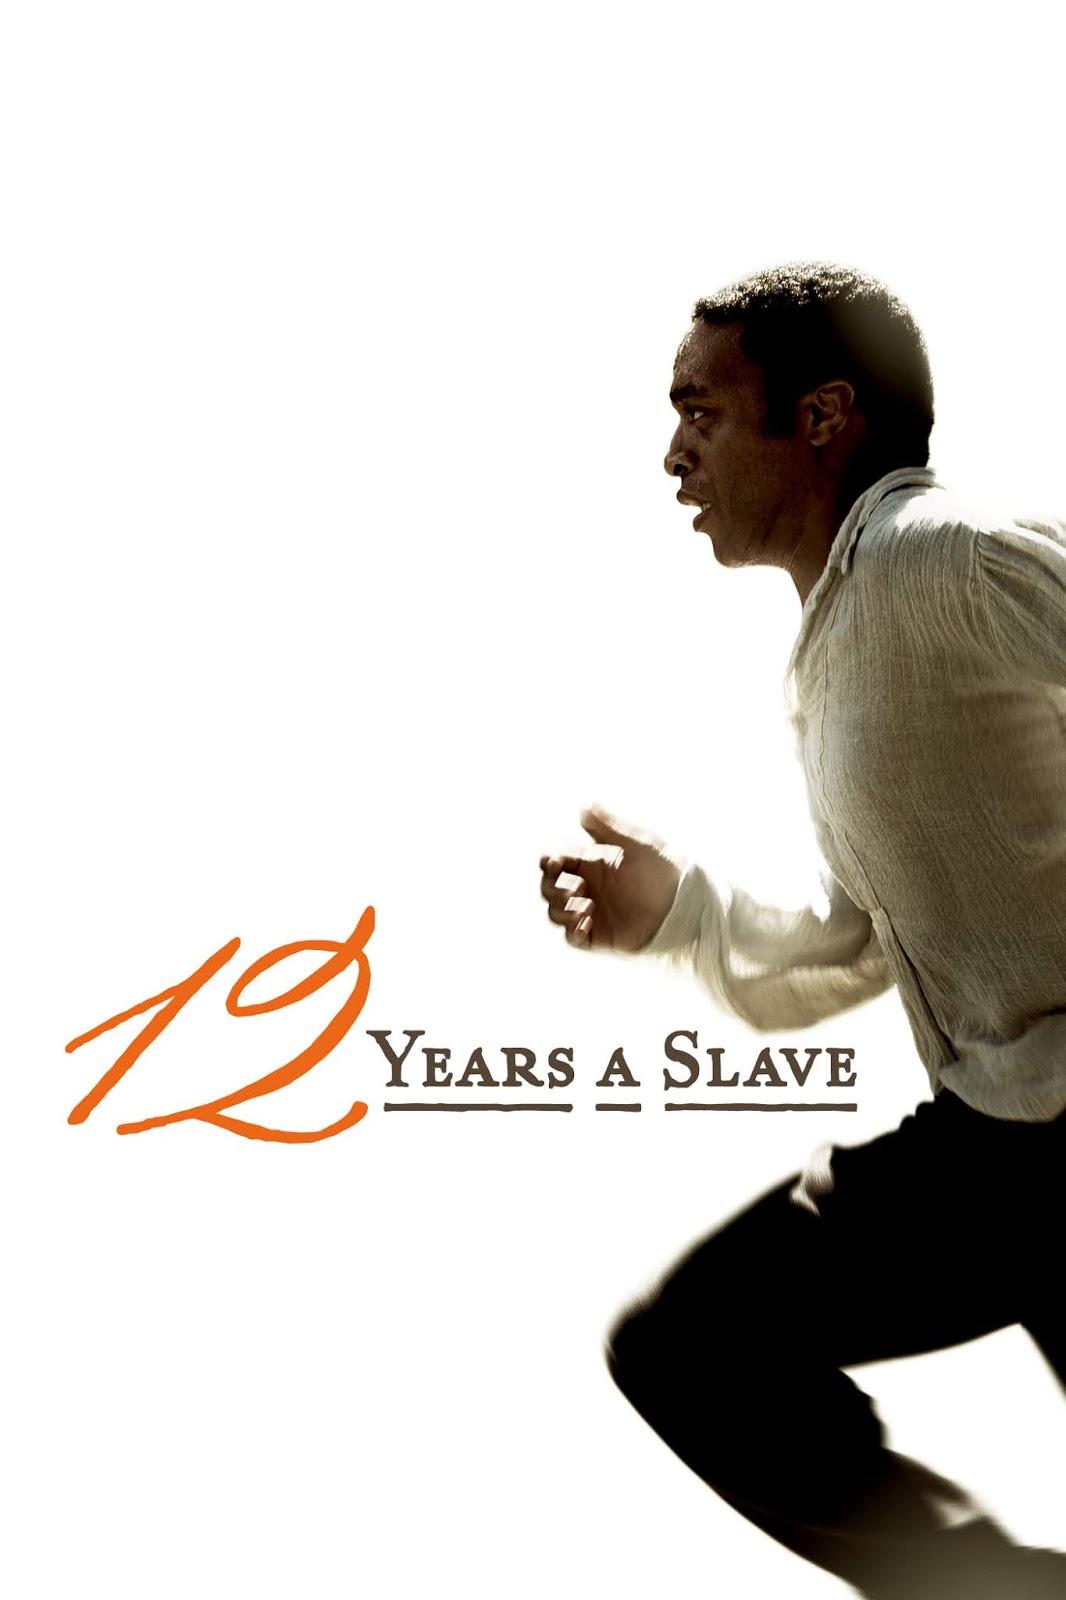 12 Years a Slave (2013) (1080p BluRay x265 HEVC 10bit AAC 5 1 afm72